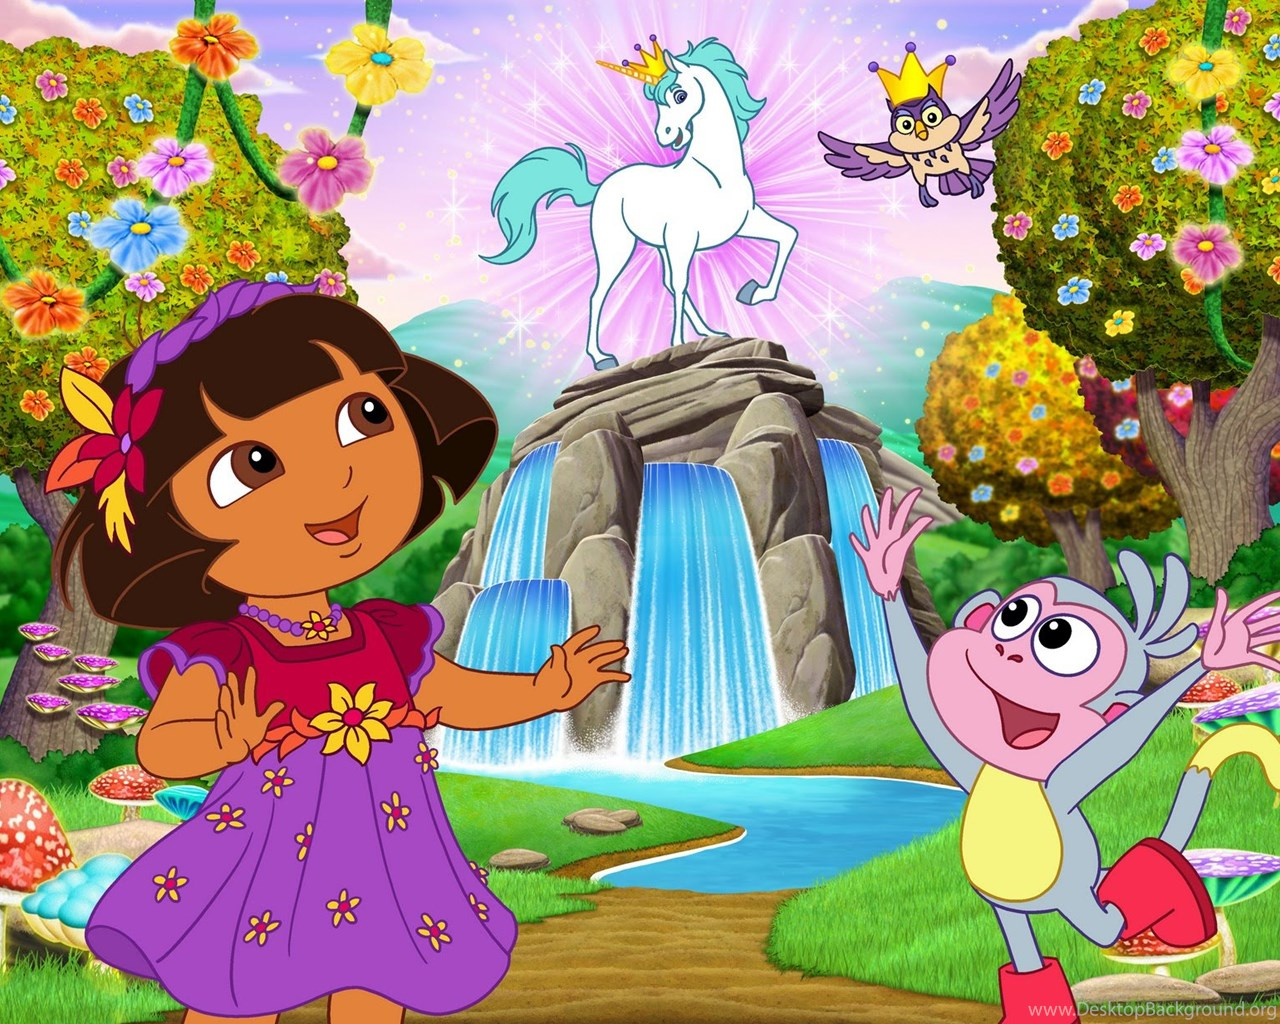 Dora The Explorer Wallpapers Hd Free Desktop Background